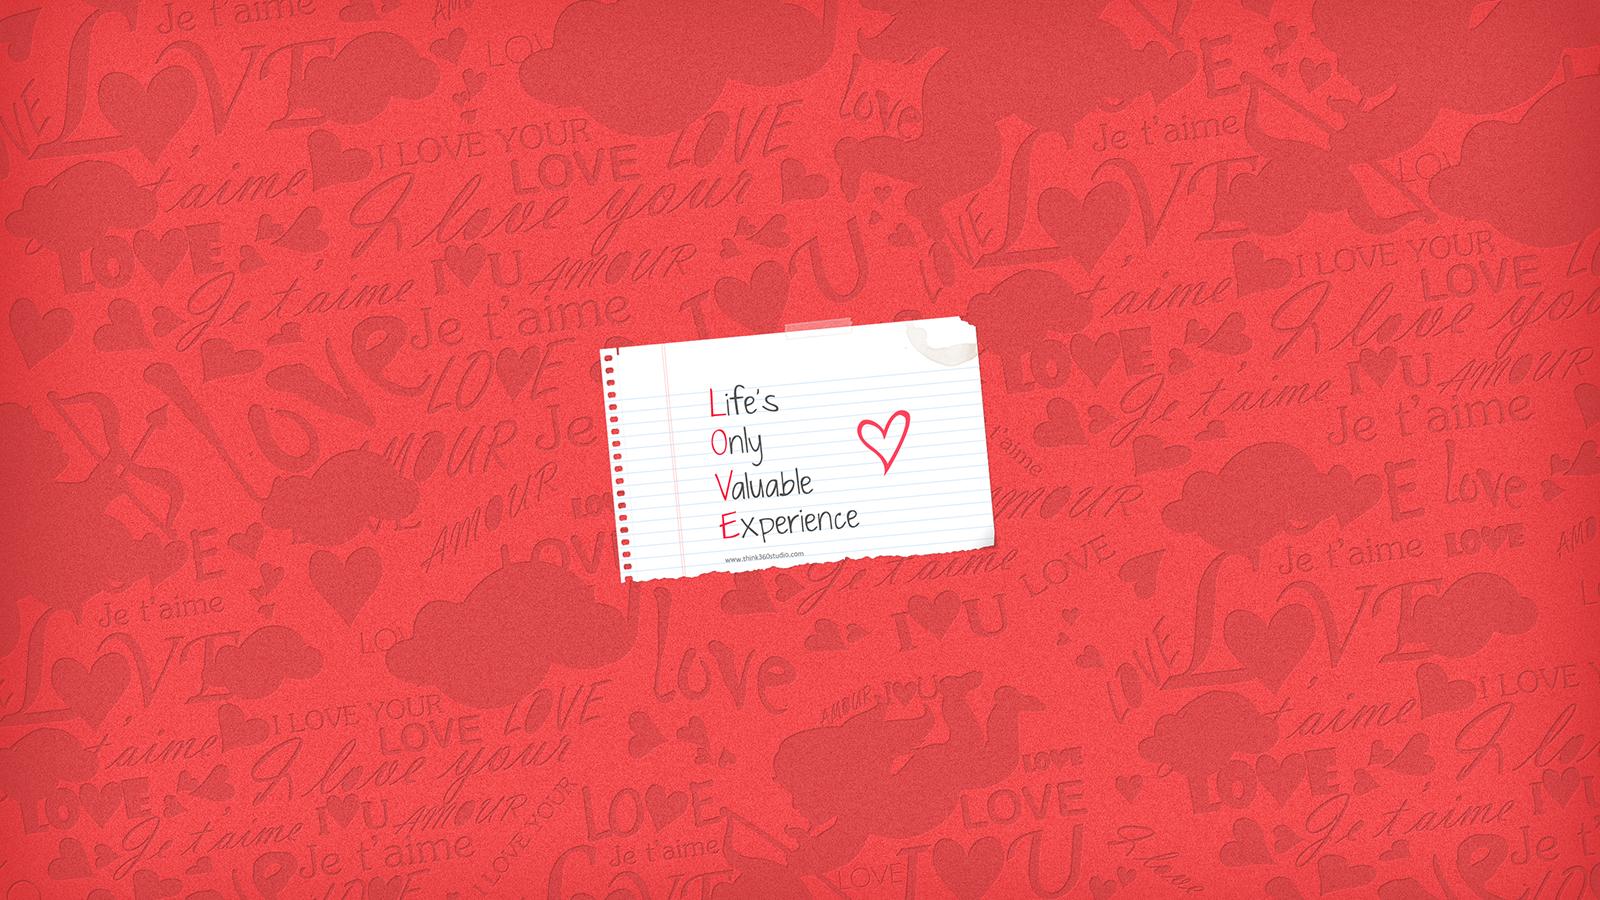 LOVE Wallpaper Pack